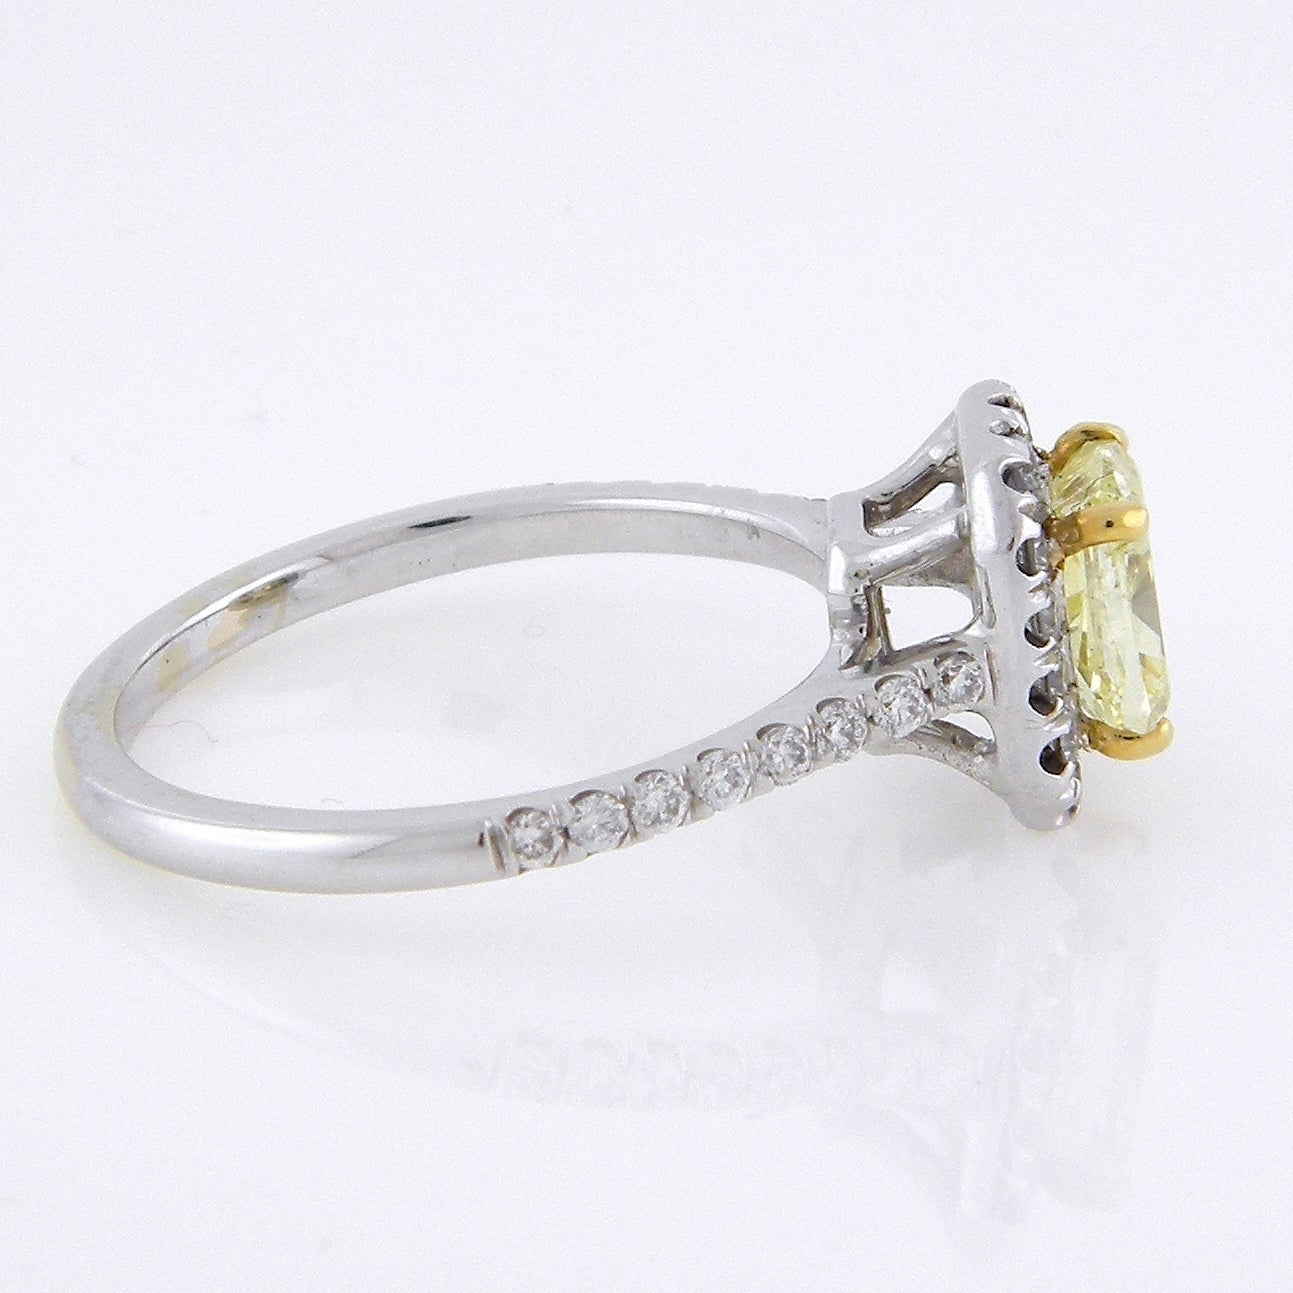 Lezari Co 1 50ct Tdw Fancy Yellow Cushion Cut Halo Diamond Engagement Ring U Pave Set Round Diamonds In Fine 18k White Gold